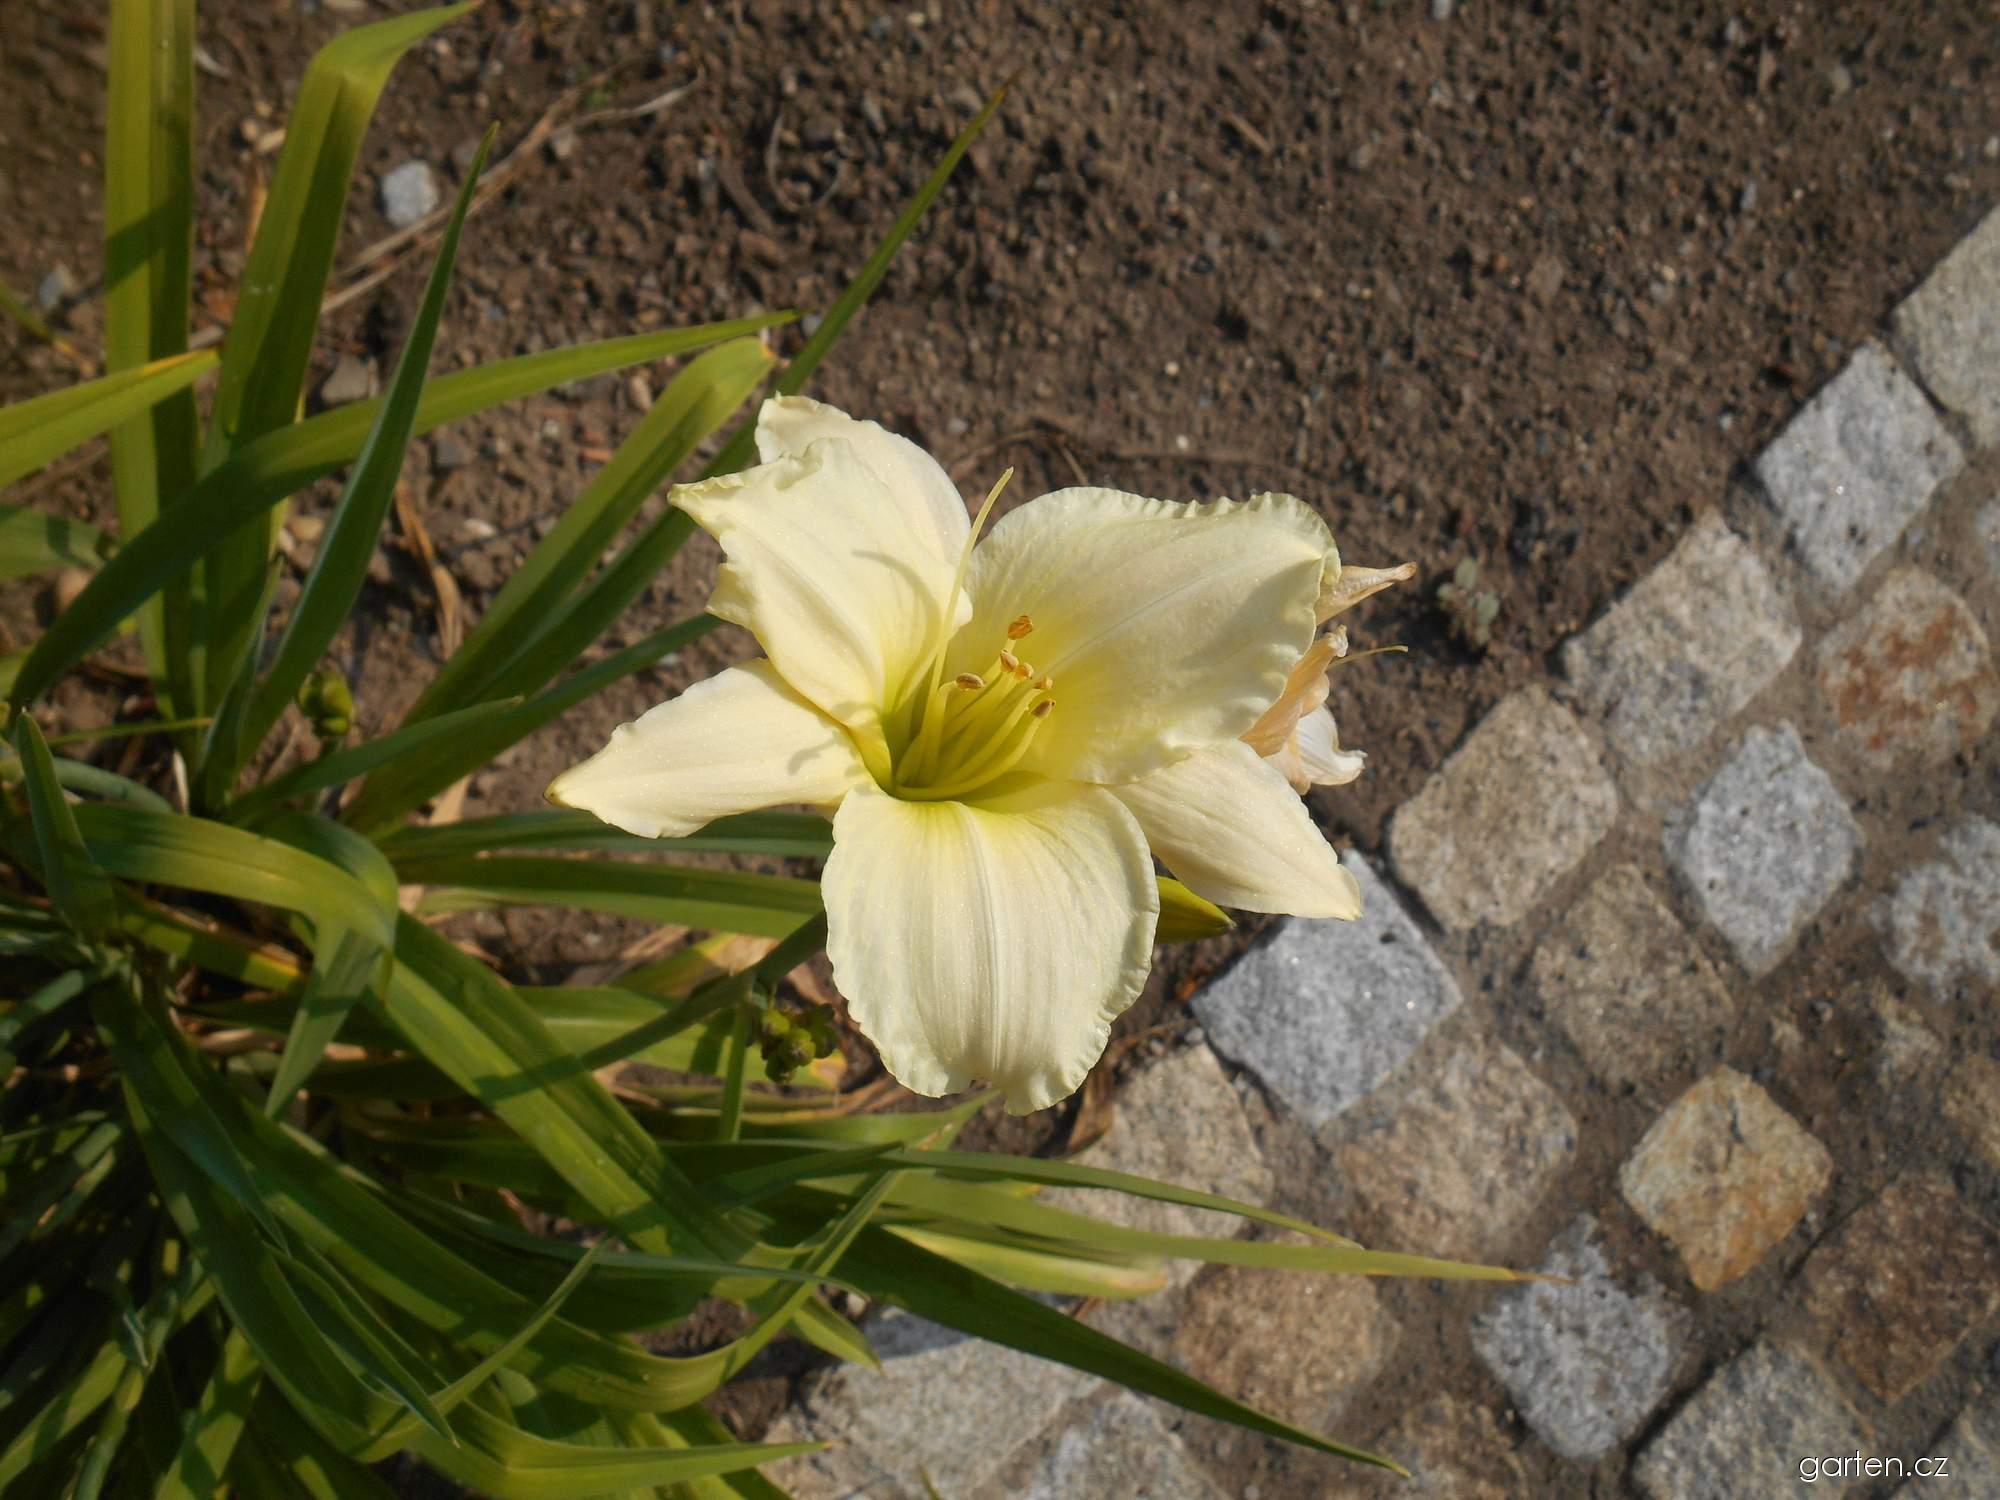 Denivka (Hemerocallis)